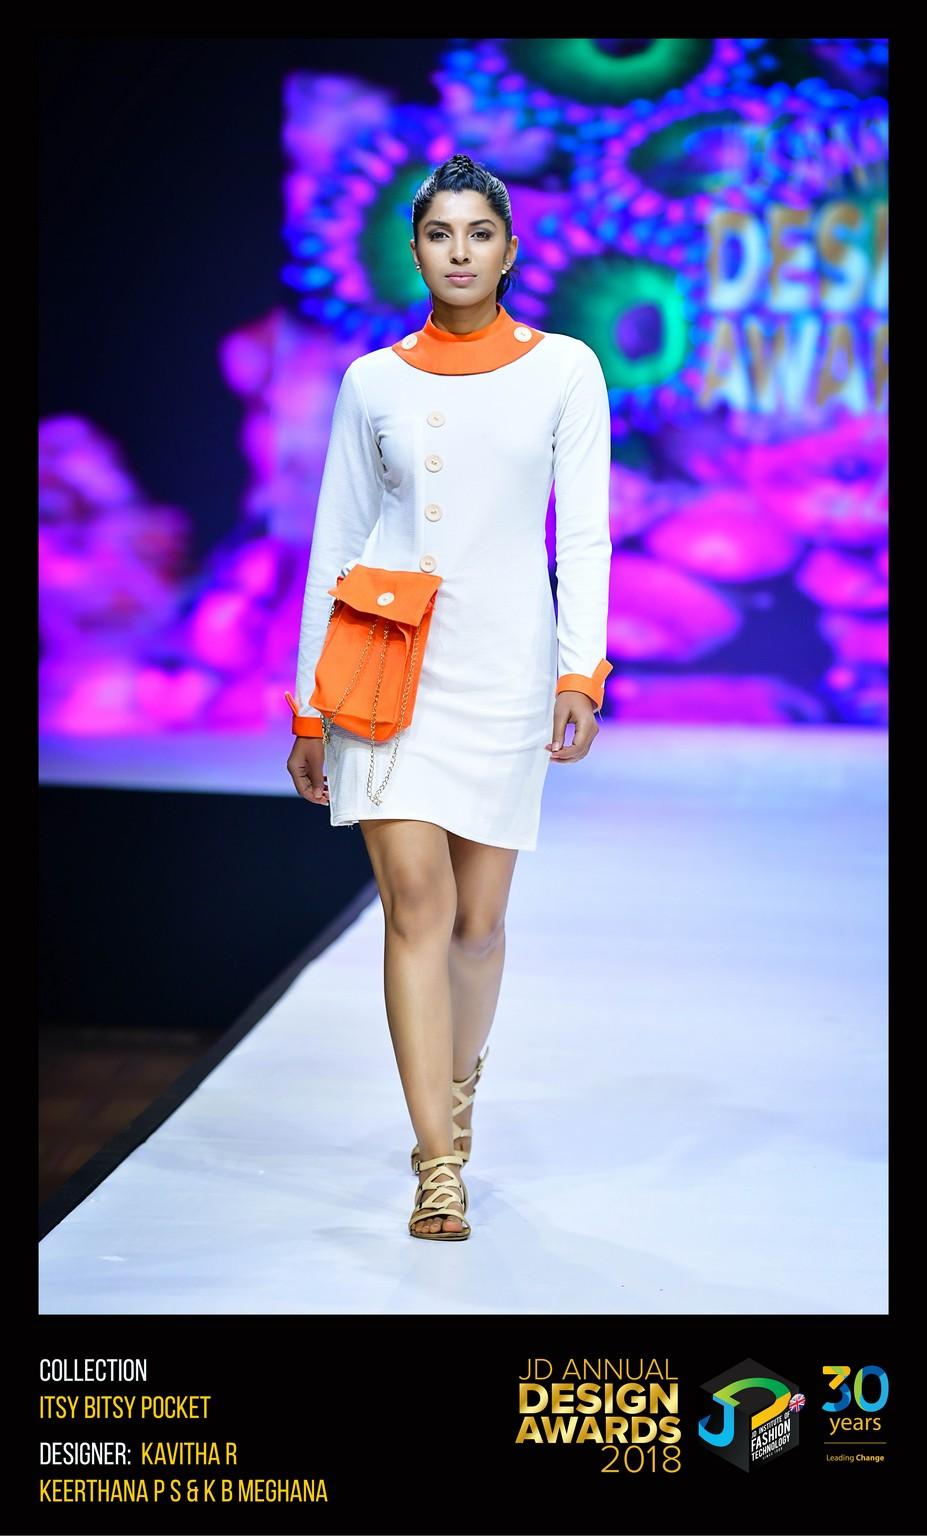 Itsy Bitsy Pocket Dress – Change – JD Annual Design Awards 2018   Designer: Kavitha, Keertana and Meghana   Photography : Jerin Nath (@jerin_nath) itsy bitsy pocket dress Itsy Bitsy Pocket Dress – Change – JD Annual Design Awards 2018 ITSY BITSY POCKET1